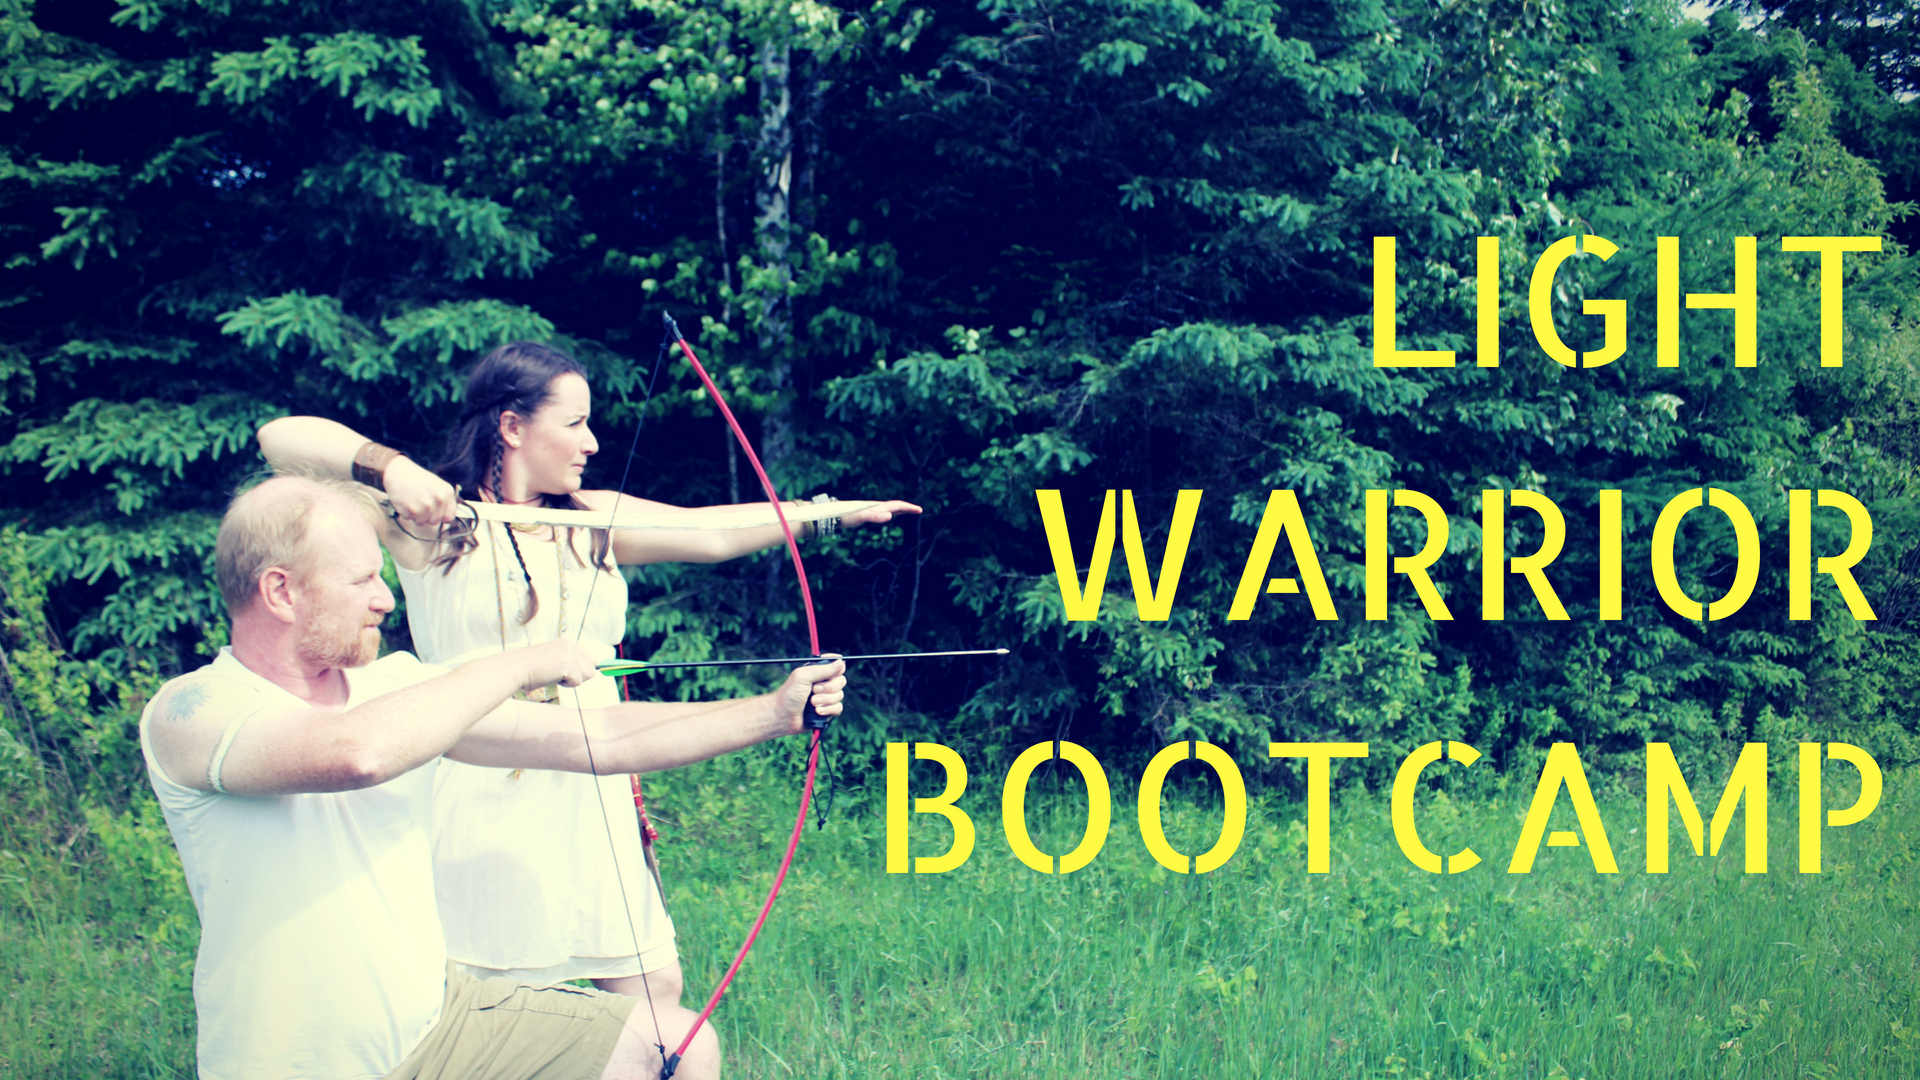 Light Warrior Bootcamp – Santainaii